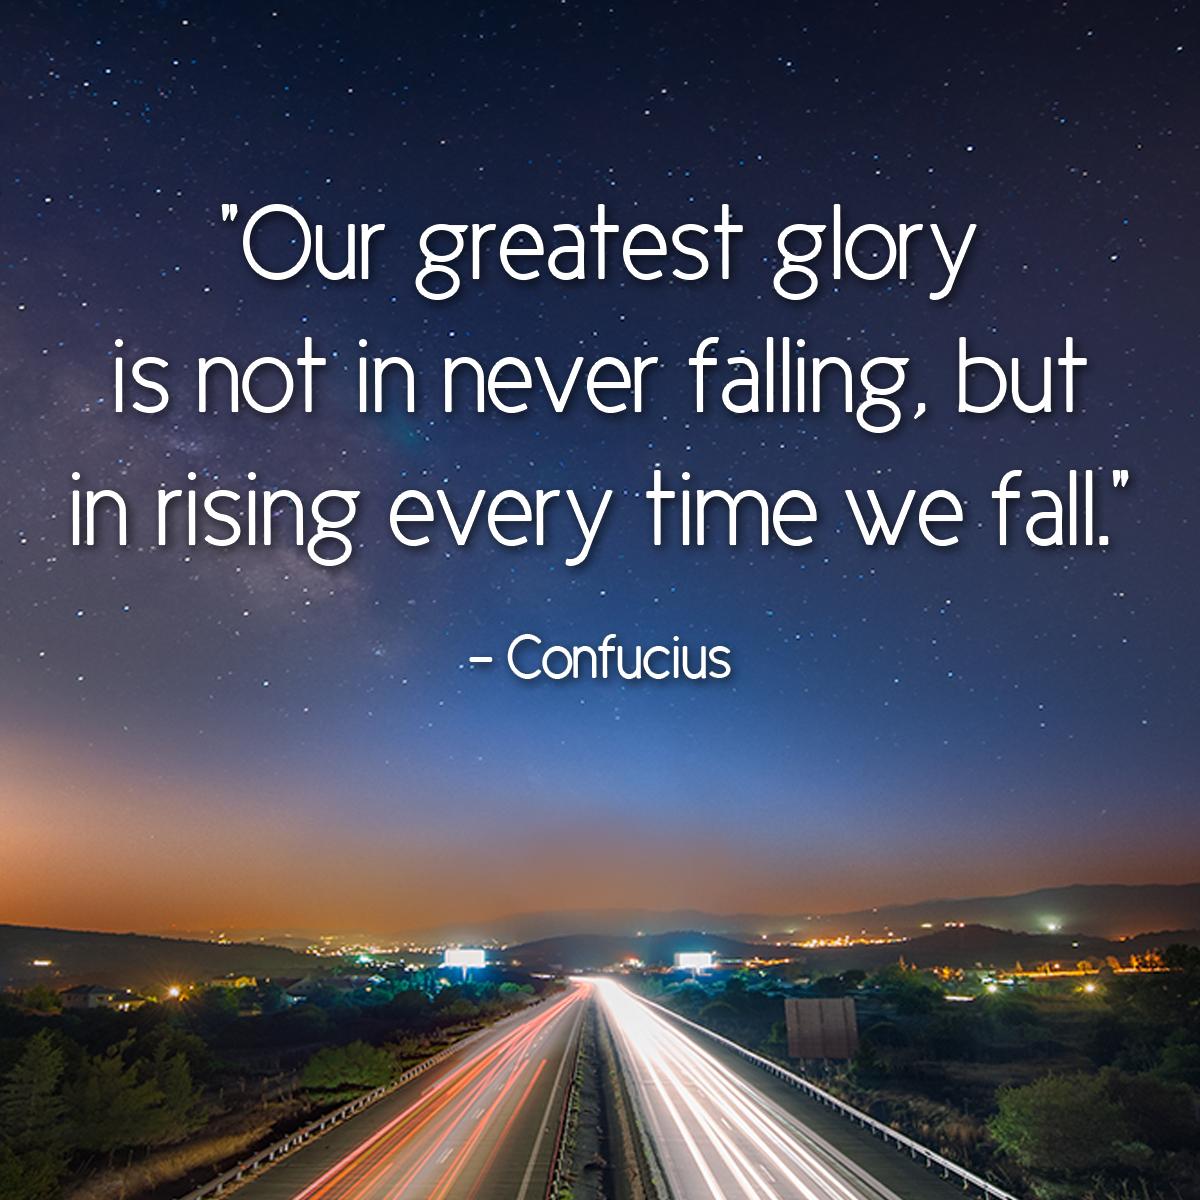 Dedicating quote #2